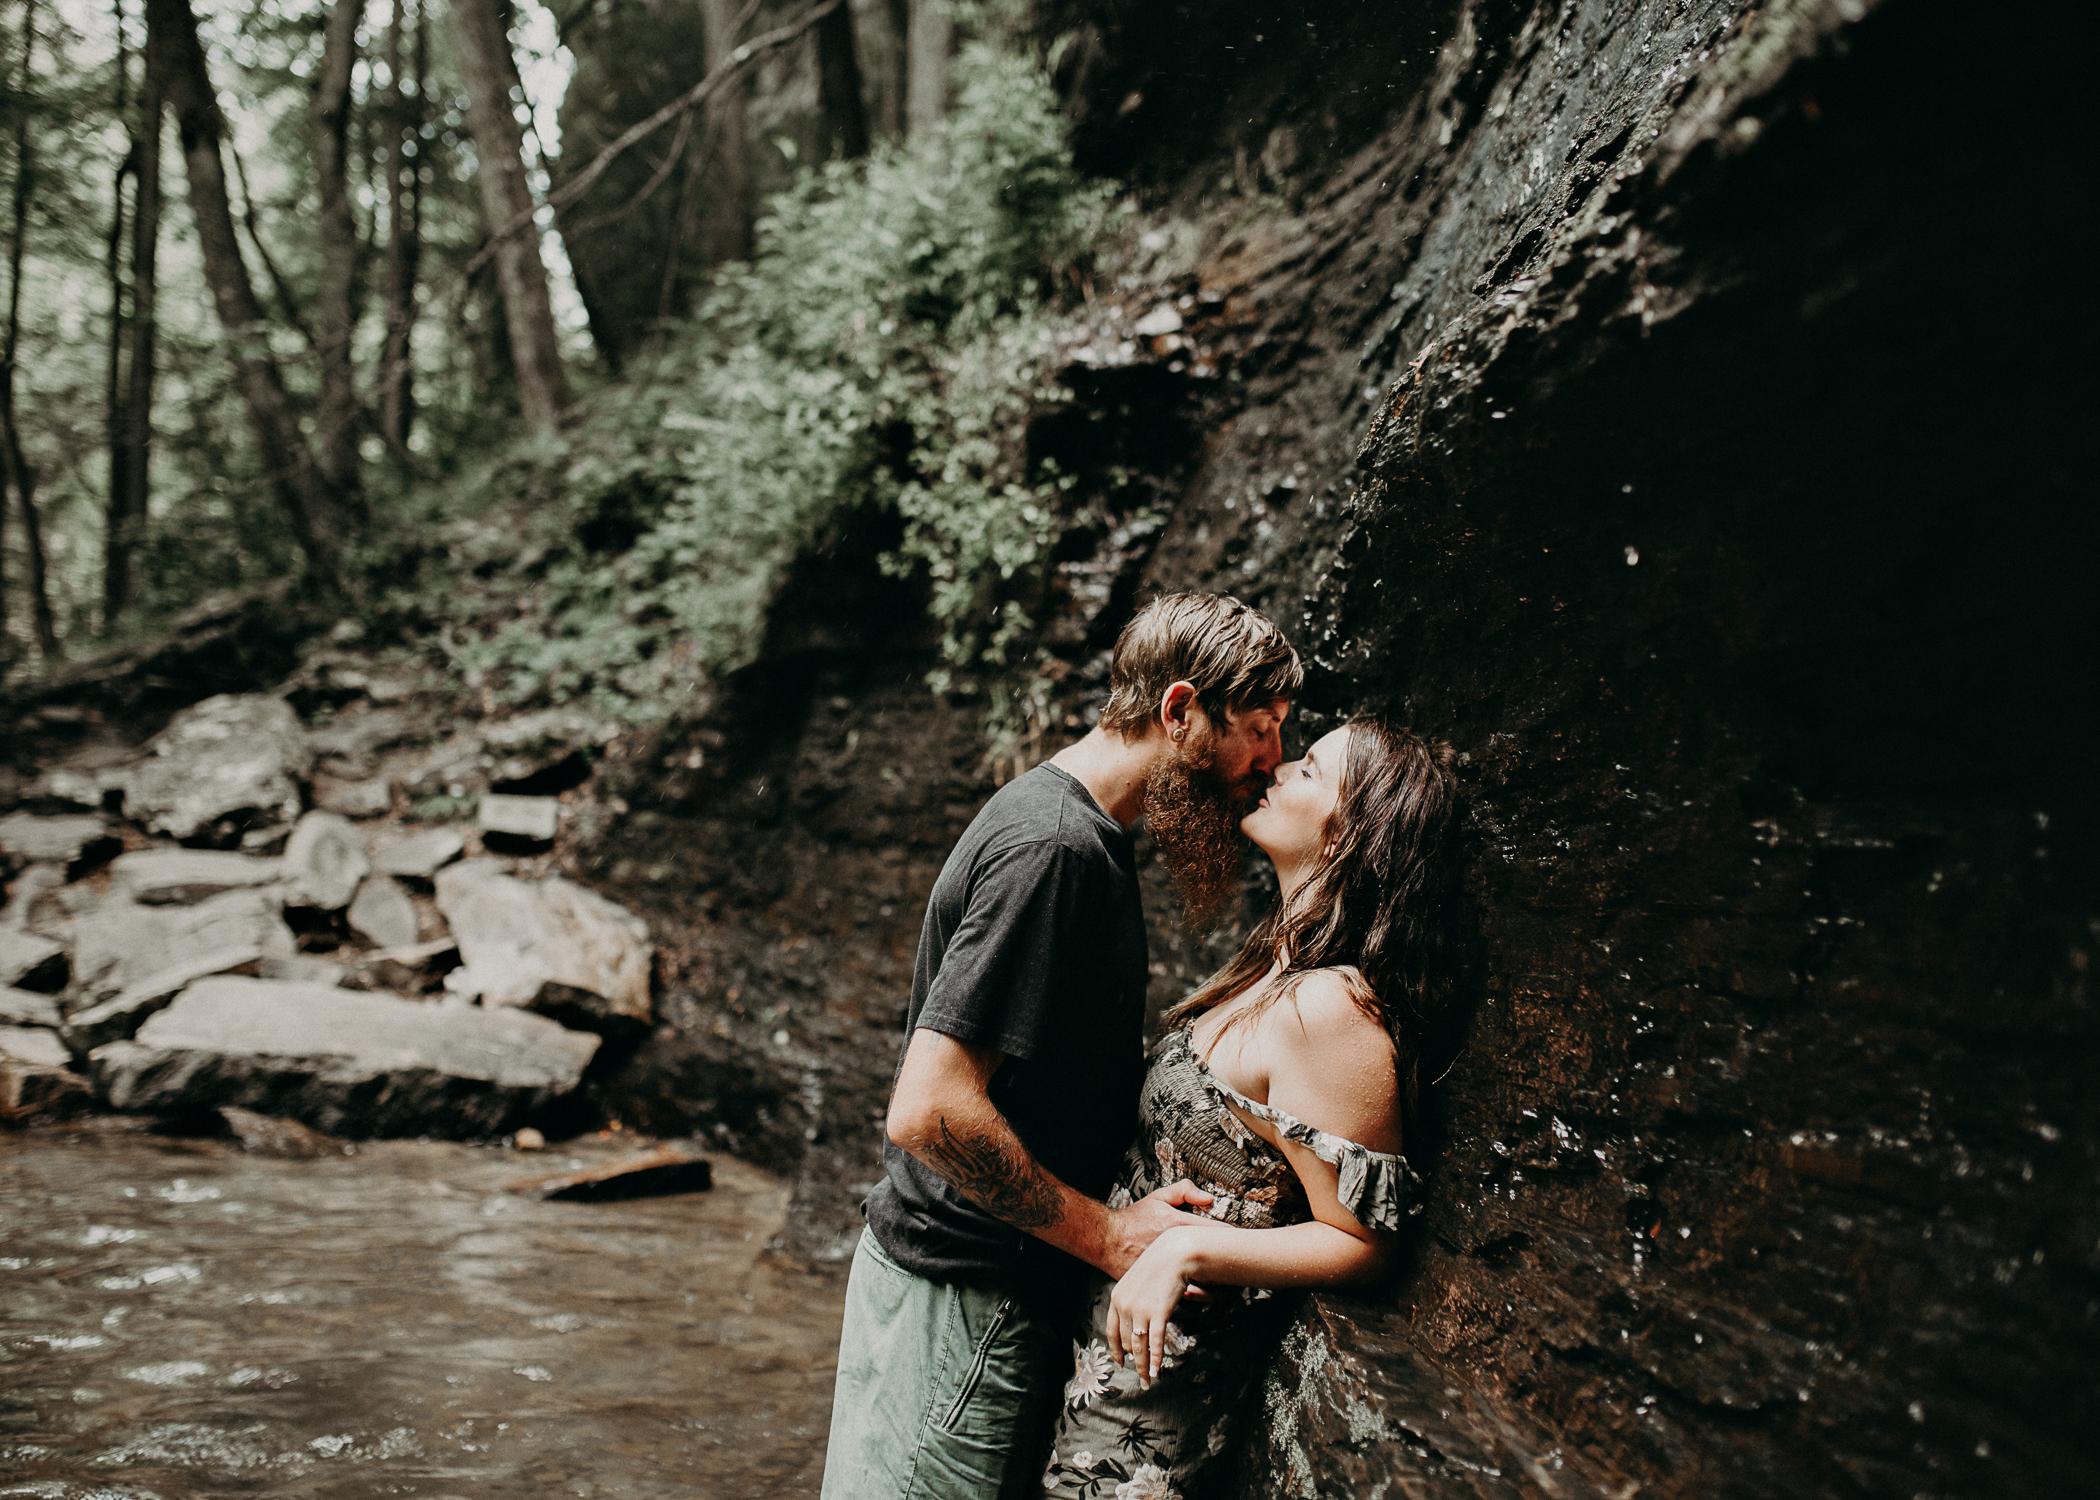 Cloudland canyon, whaterfall georgia, couples waterfall engagement 22.jpg